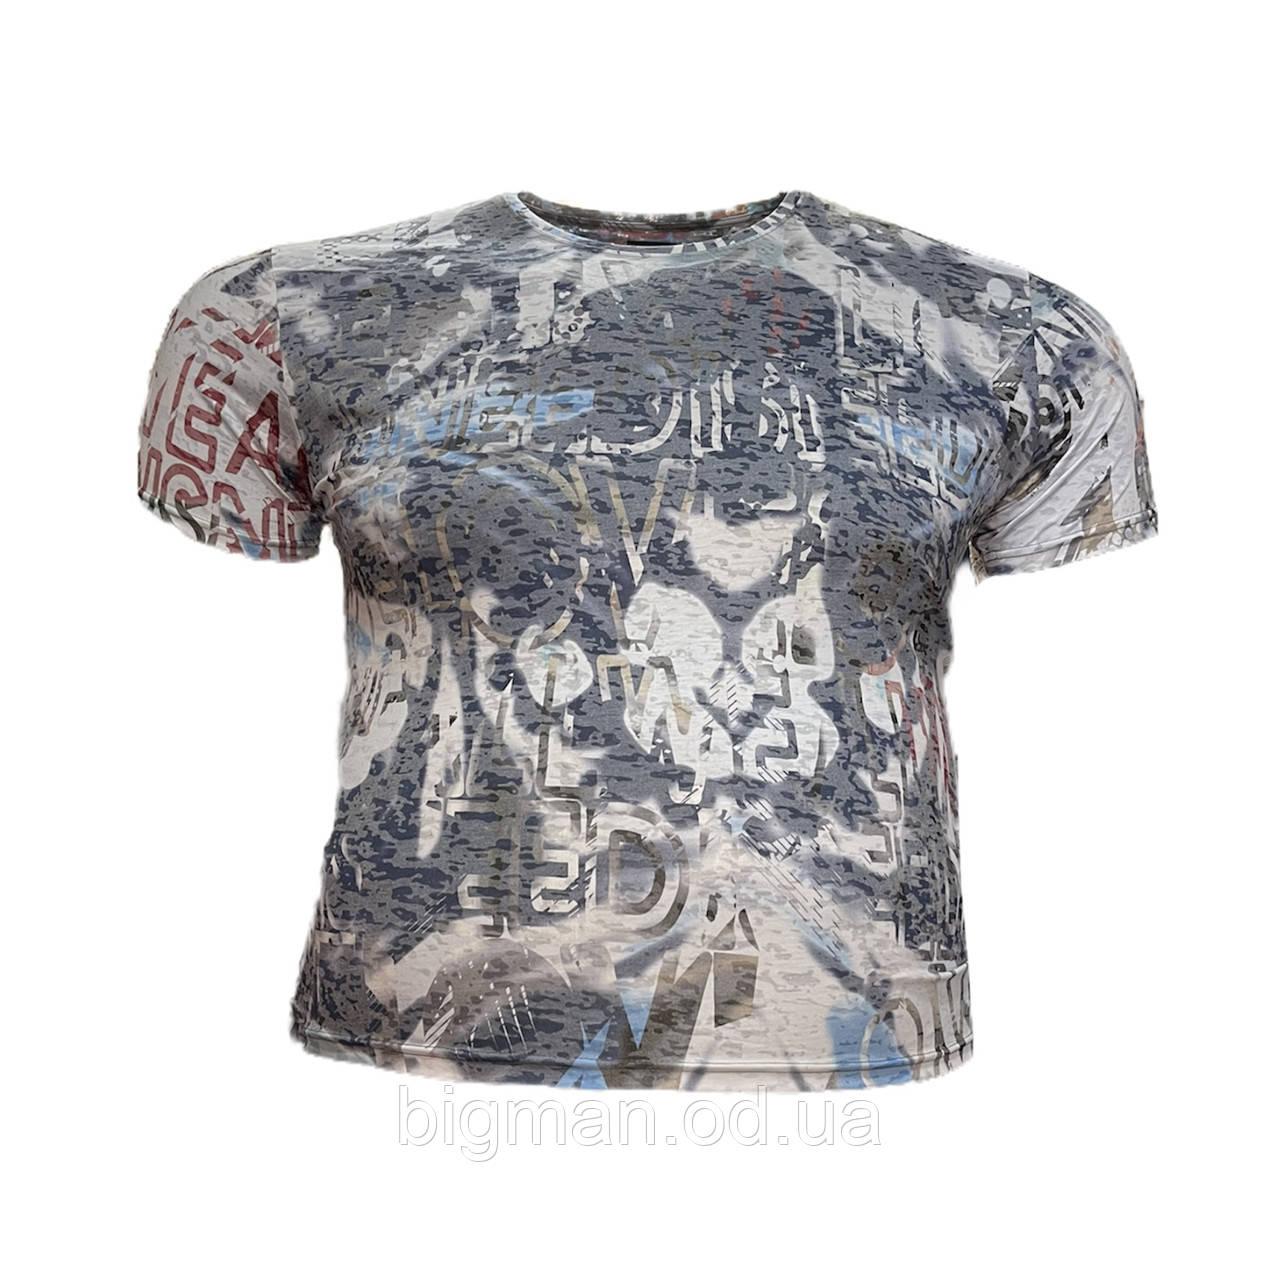 Мужская батальная футболка на резинке Jean Piere 12123 6XL 7XL 8XL серая большие размеры Турция